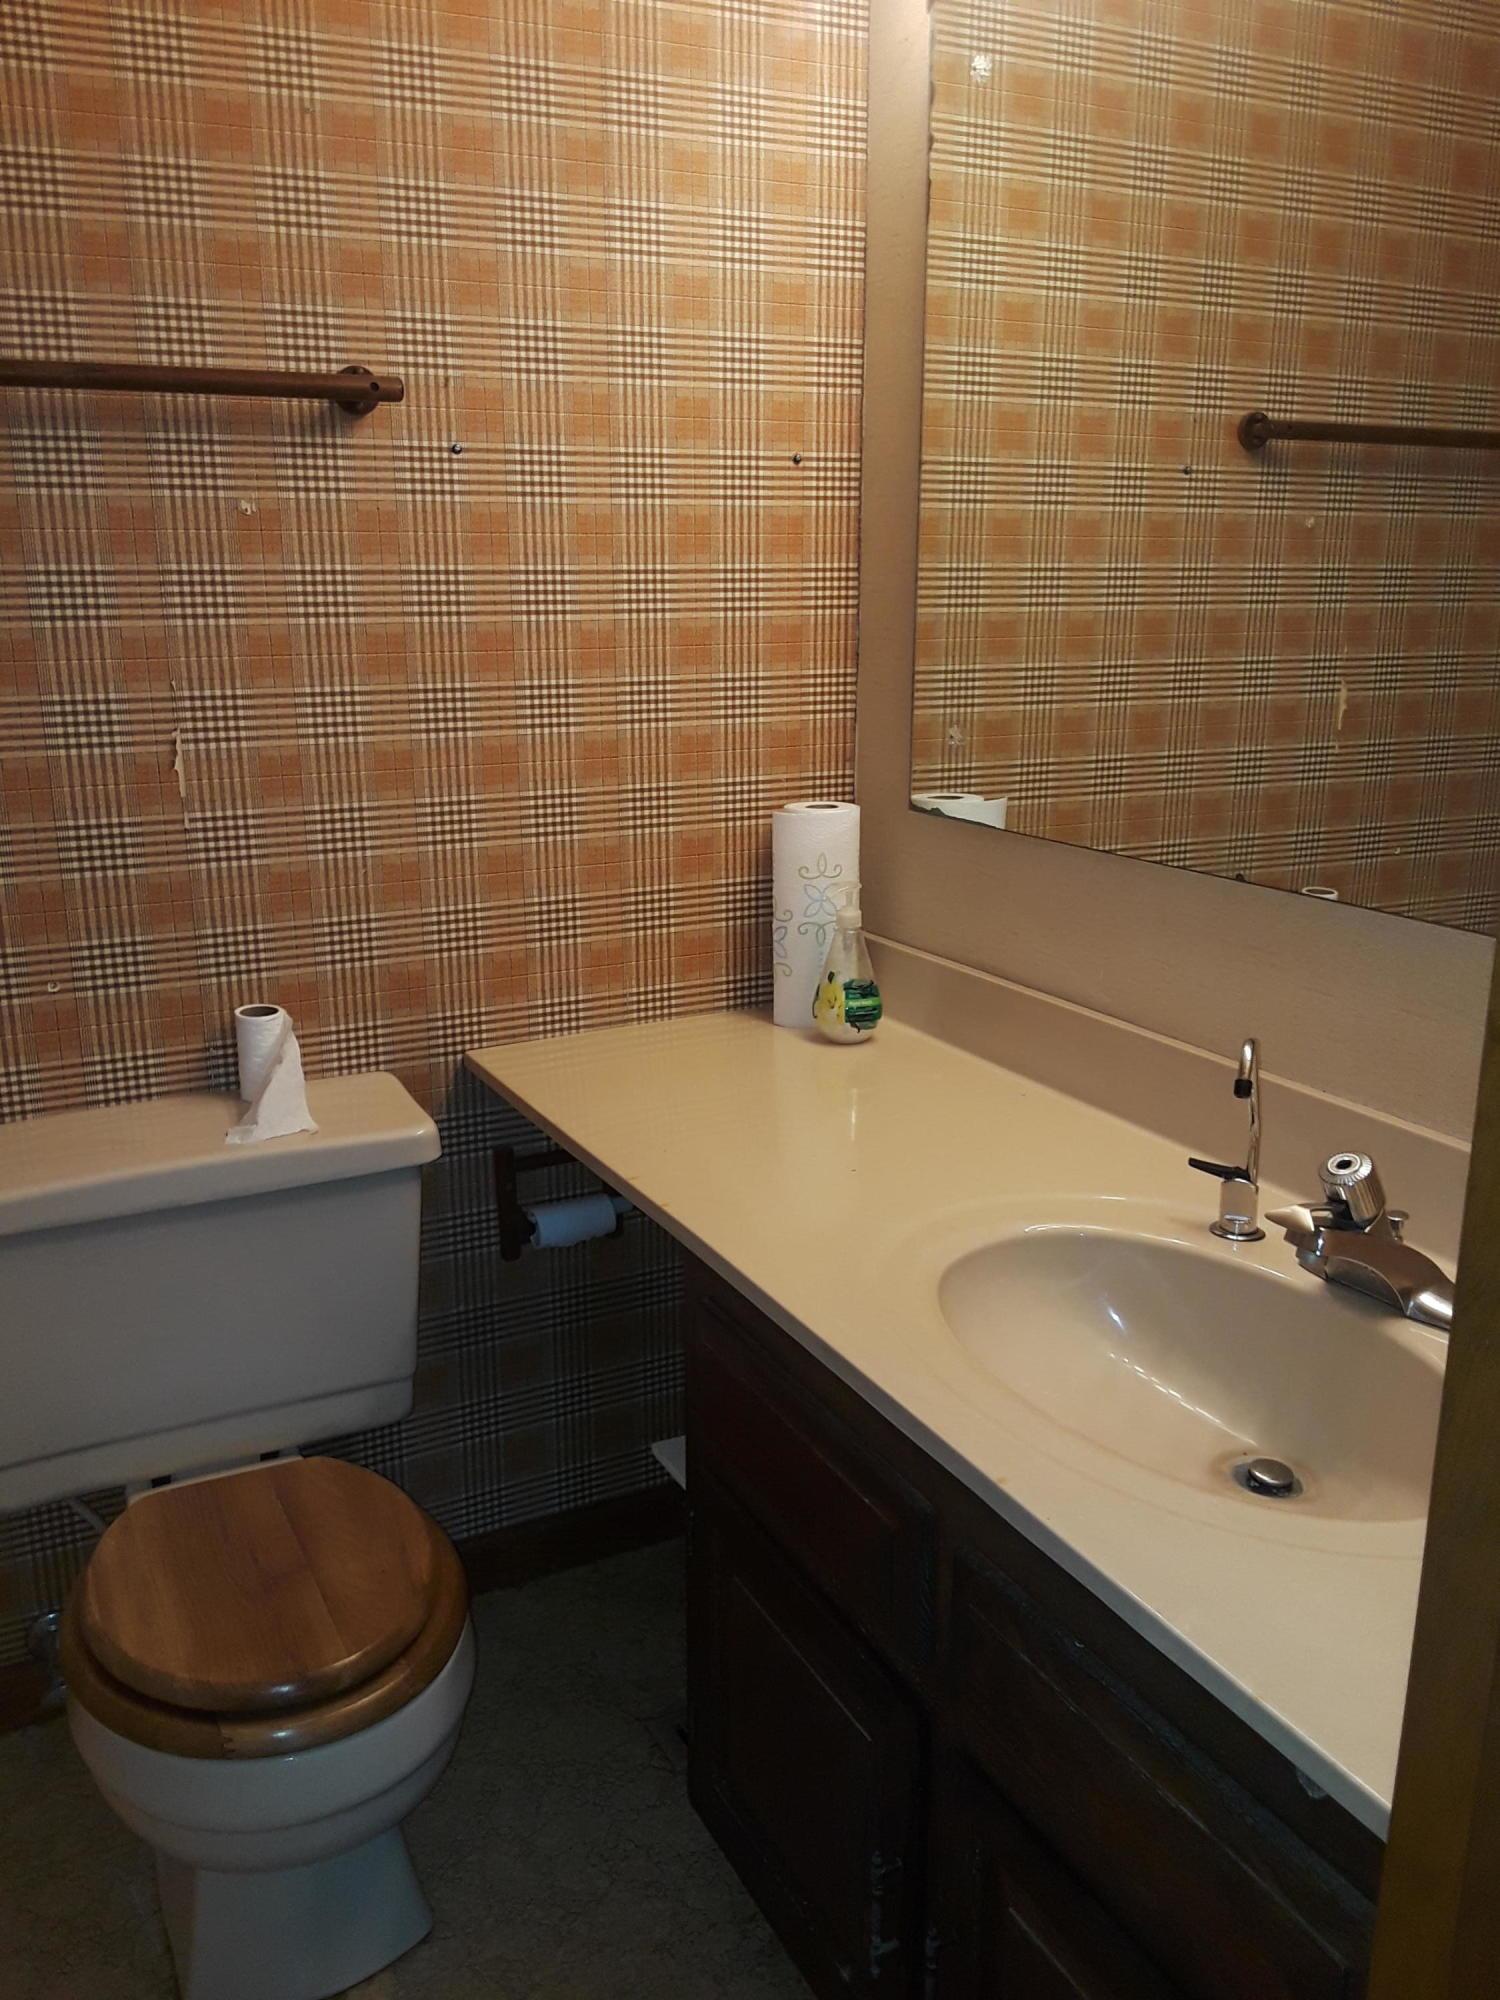 3536 Big Springs Ridge, Friendsville, Tennessee, United States 37737, 3 Bedrooms Bedrooms, ,3 BathroomsBathrooms,Single Family,For Sale,Big Springs Ridge,1052321